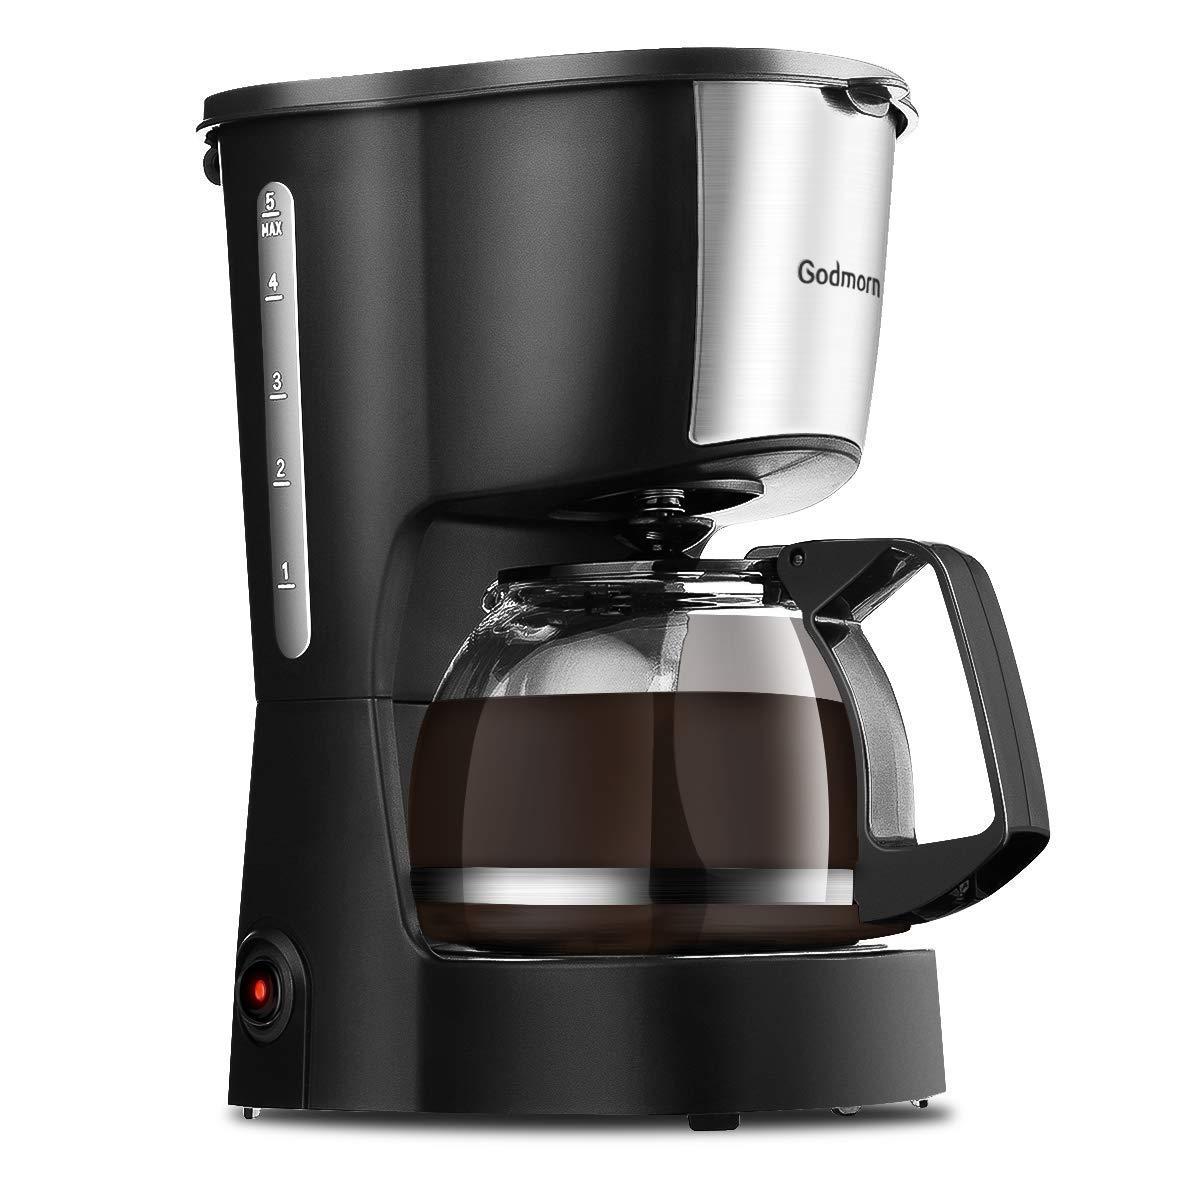 Godmorn Kaffeemaschine, Filterkaffeemaschine Automatische Endabschaltung